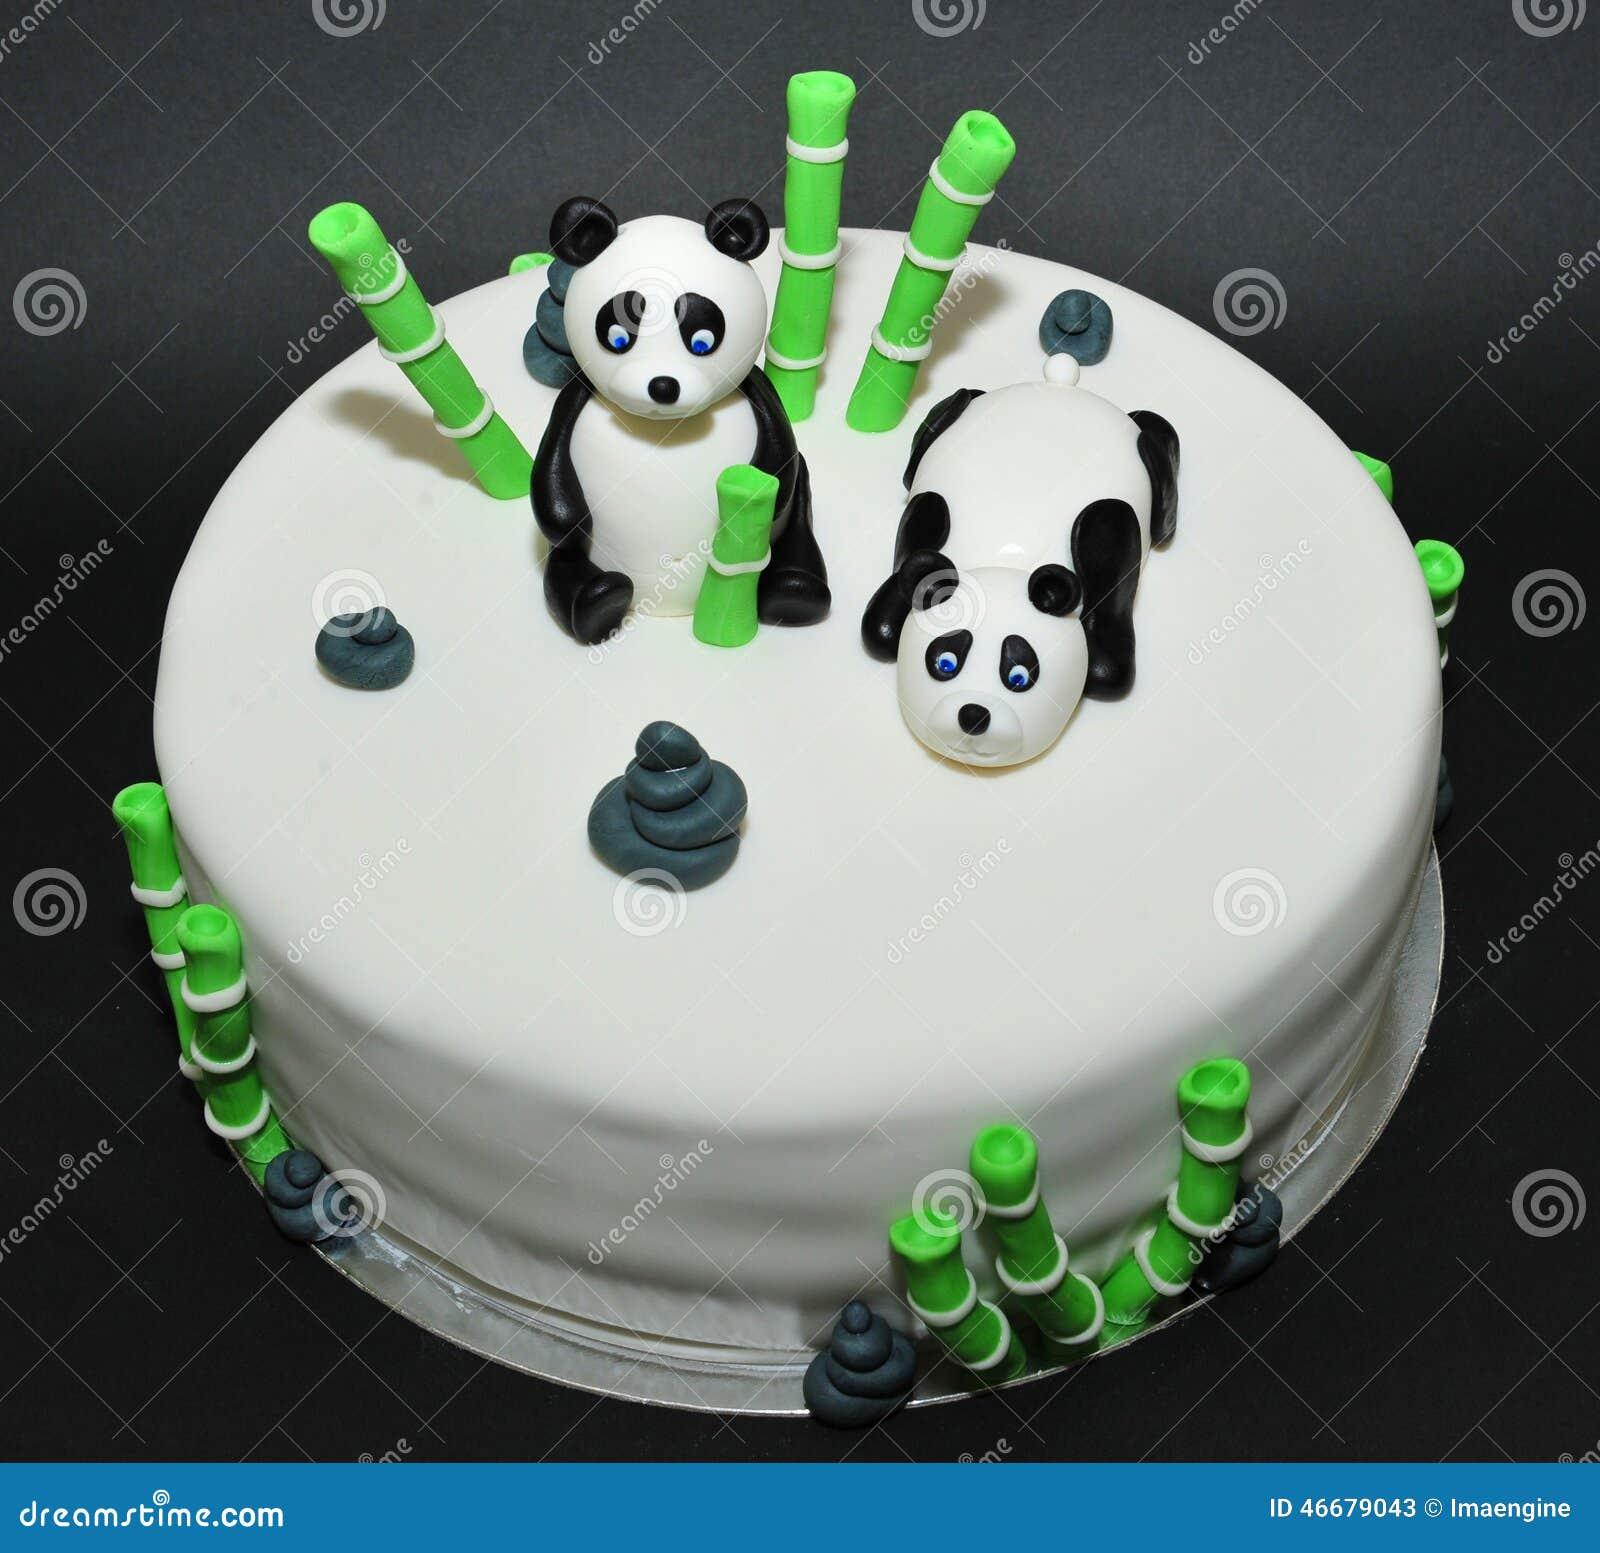 Groovy Panda Bears Fondant Birthday Cake Stock Image Image Of Celebrate Funny Birthday Cards Online Inifofree Goldxyz